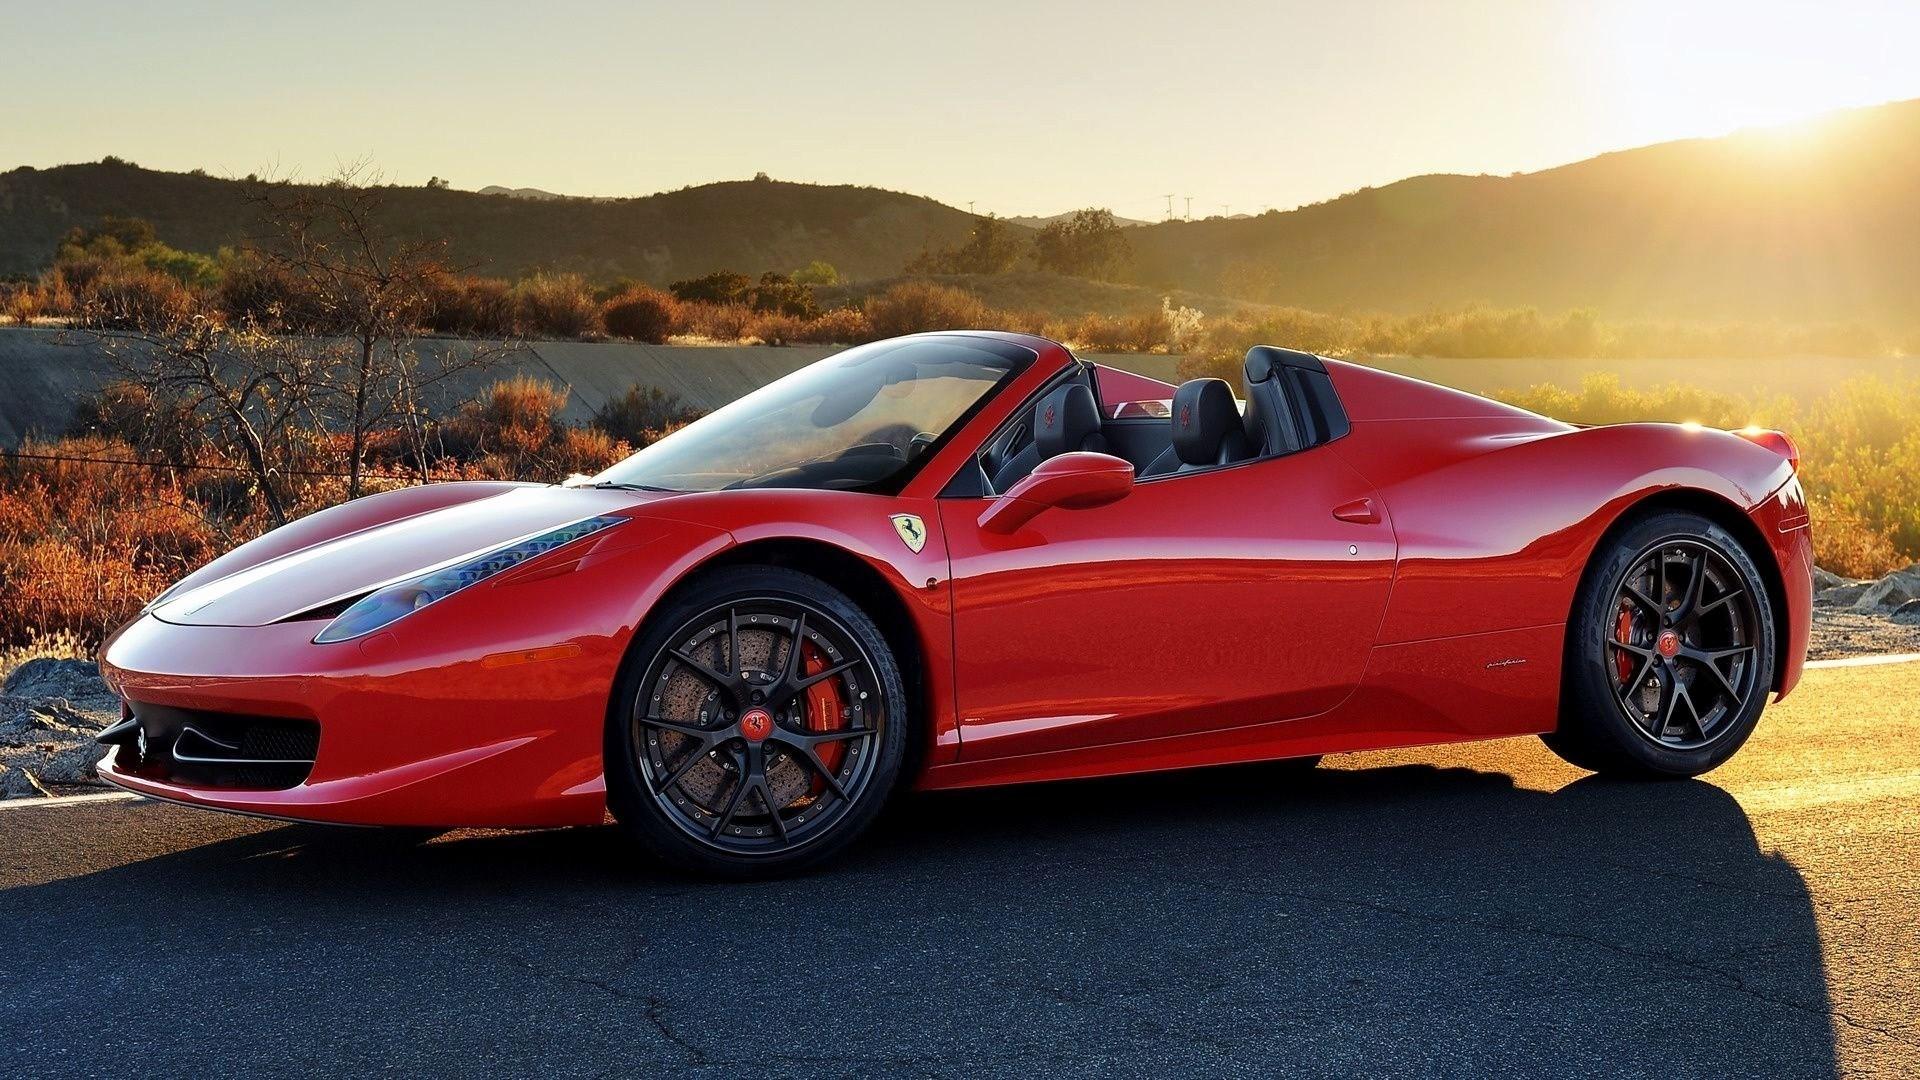 Ferrari 458 Italia Wallpaper Hd 75 Pictures